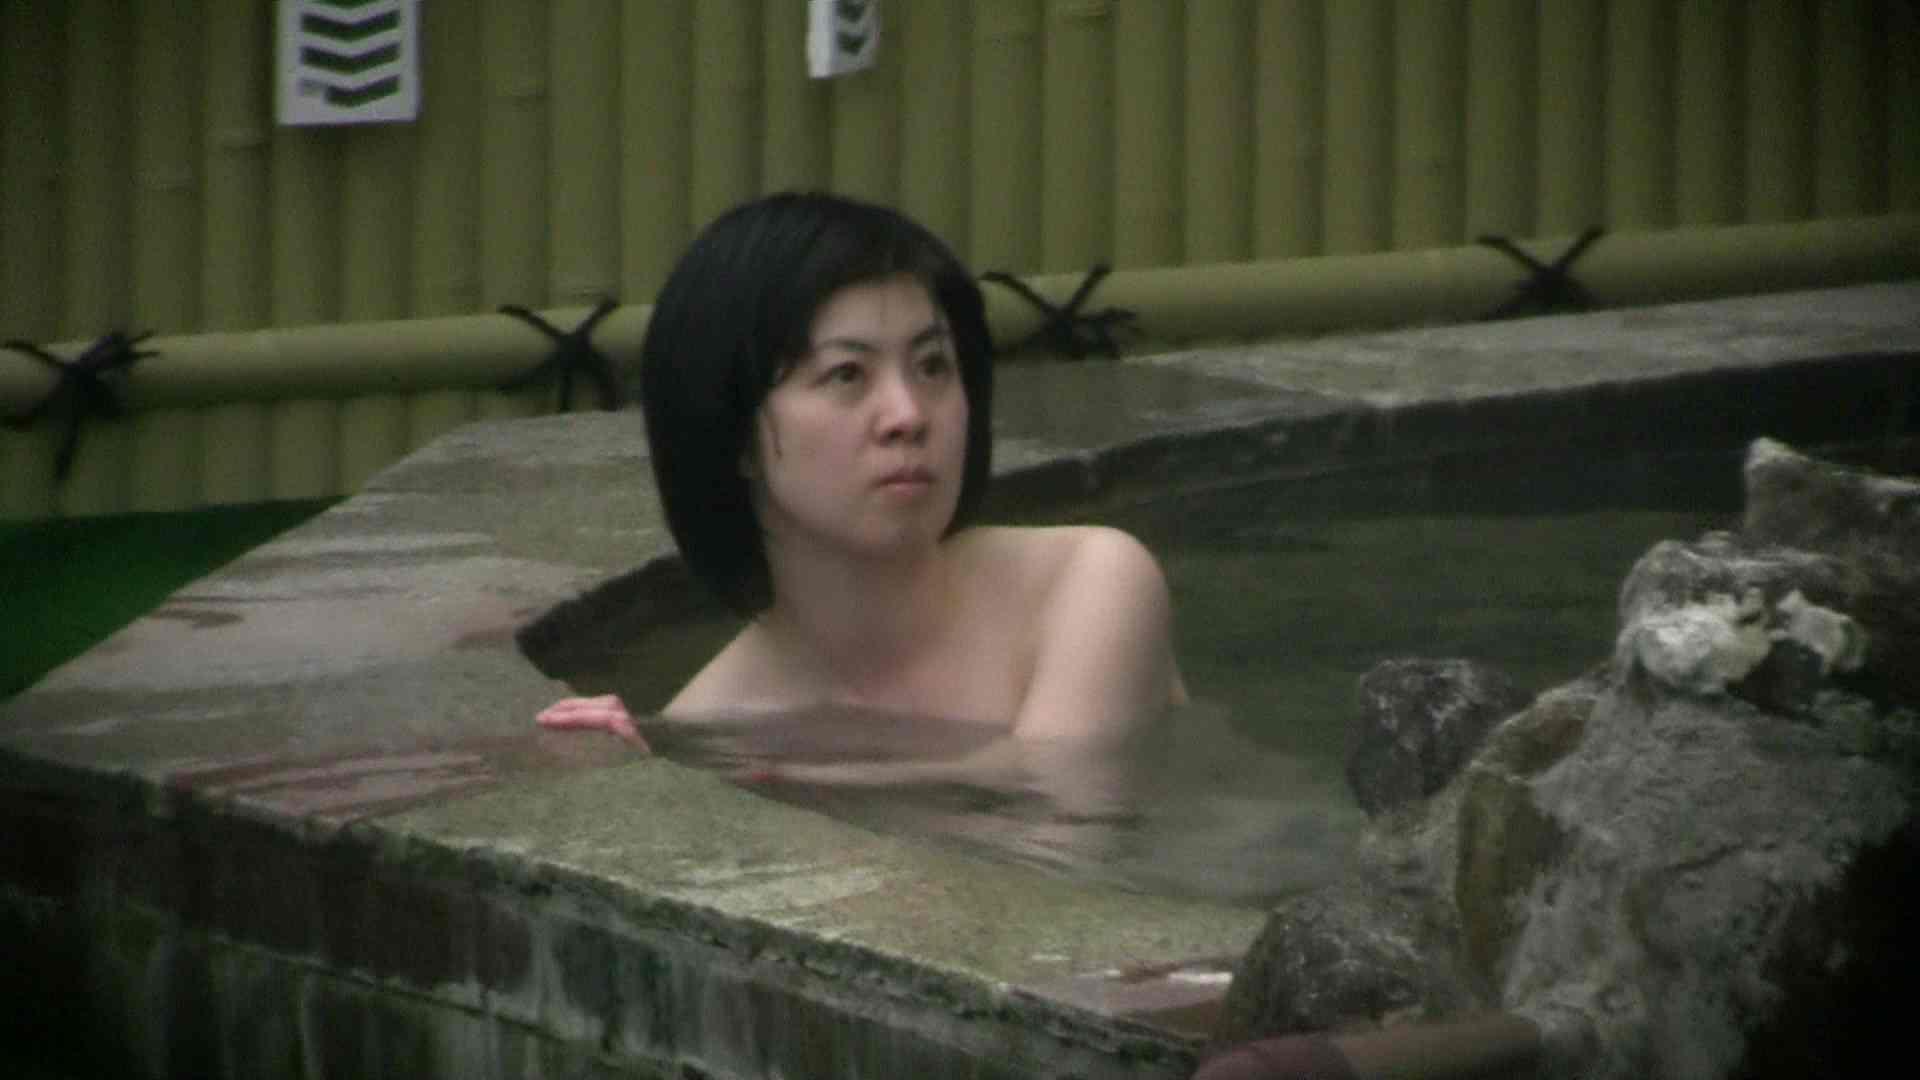 Aquaな露天風呂Vol.685 露天風呂突入 | 盗撮師作品  88pic 22